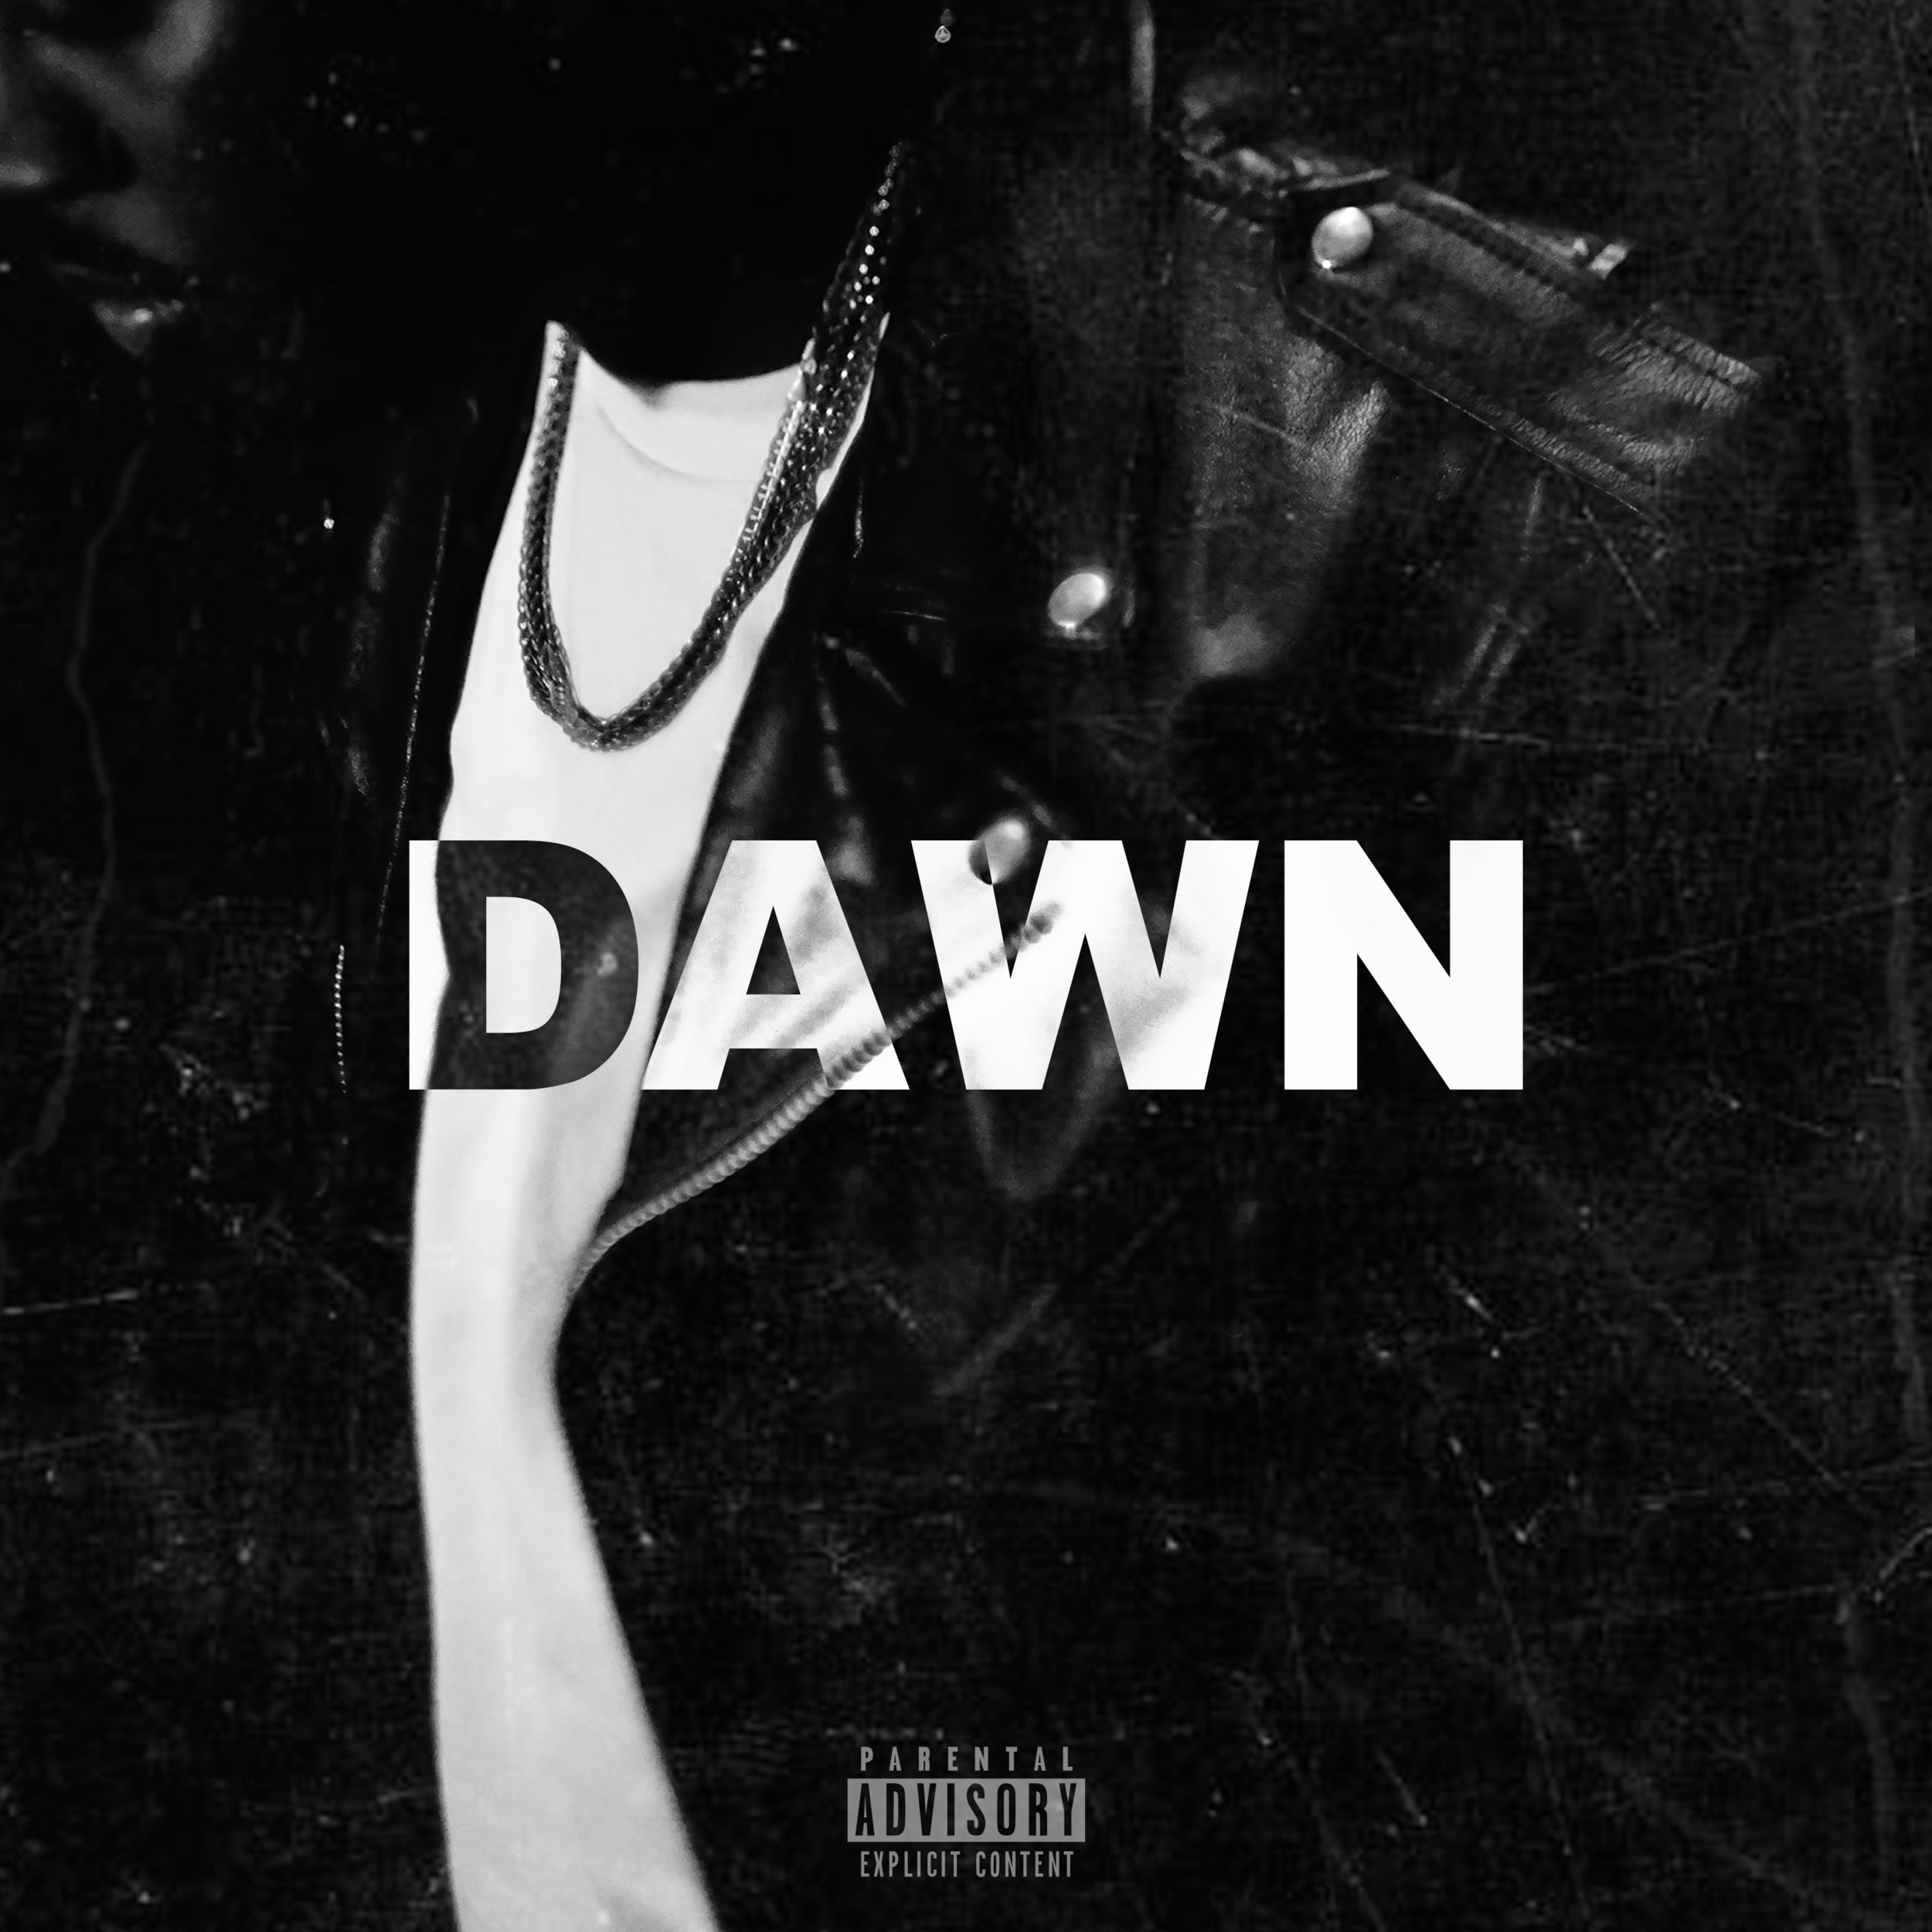 DawnCoverART-1.png